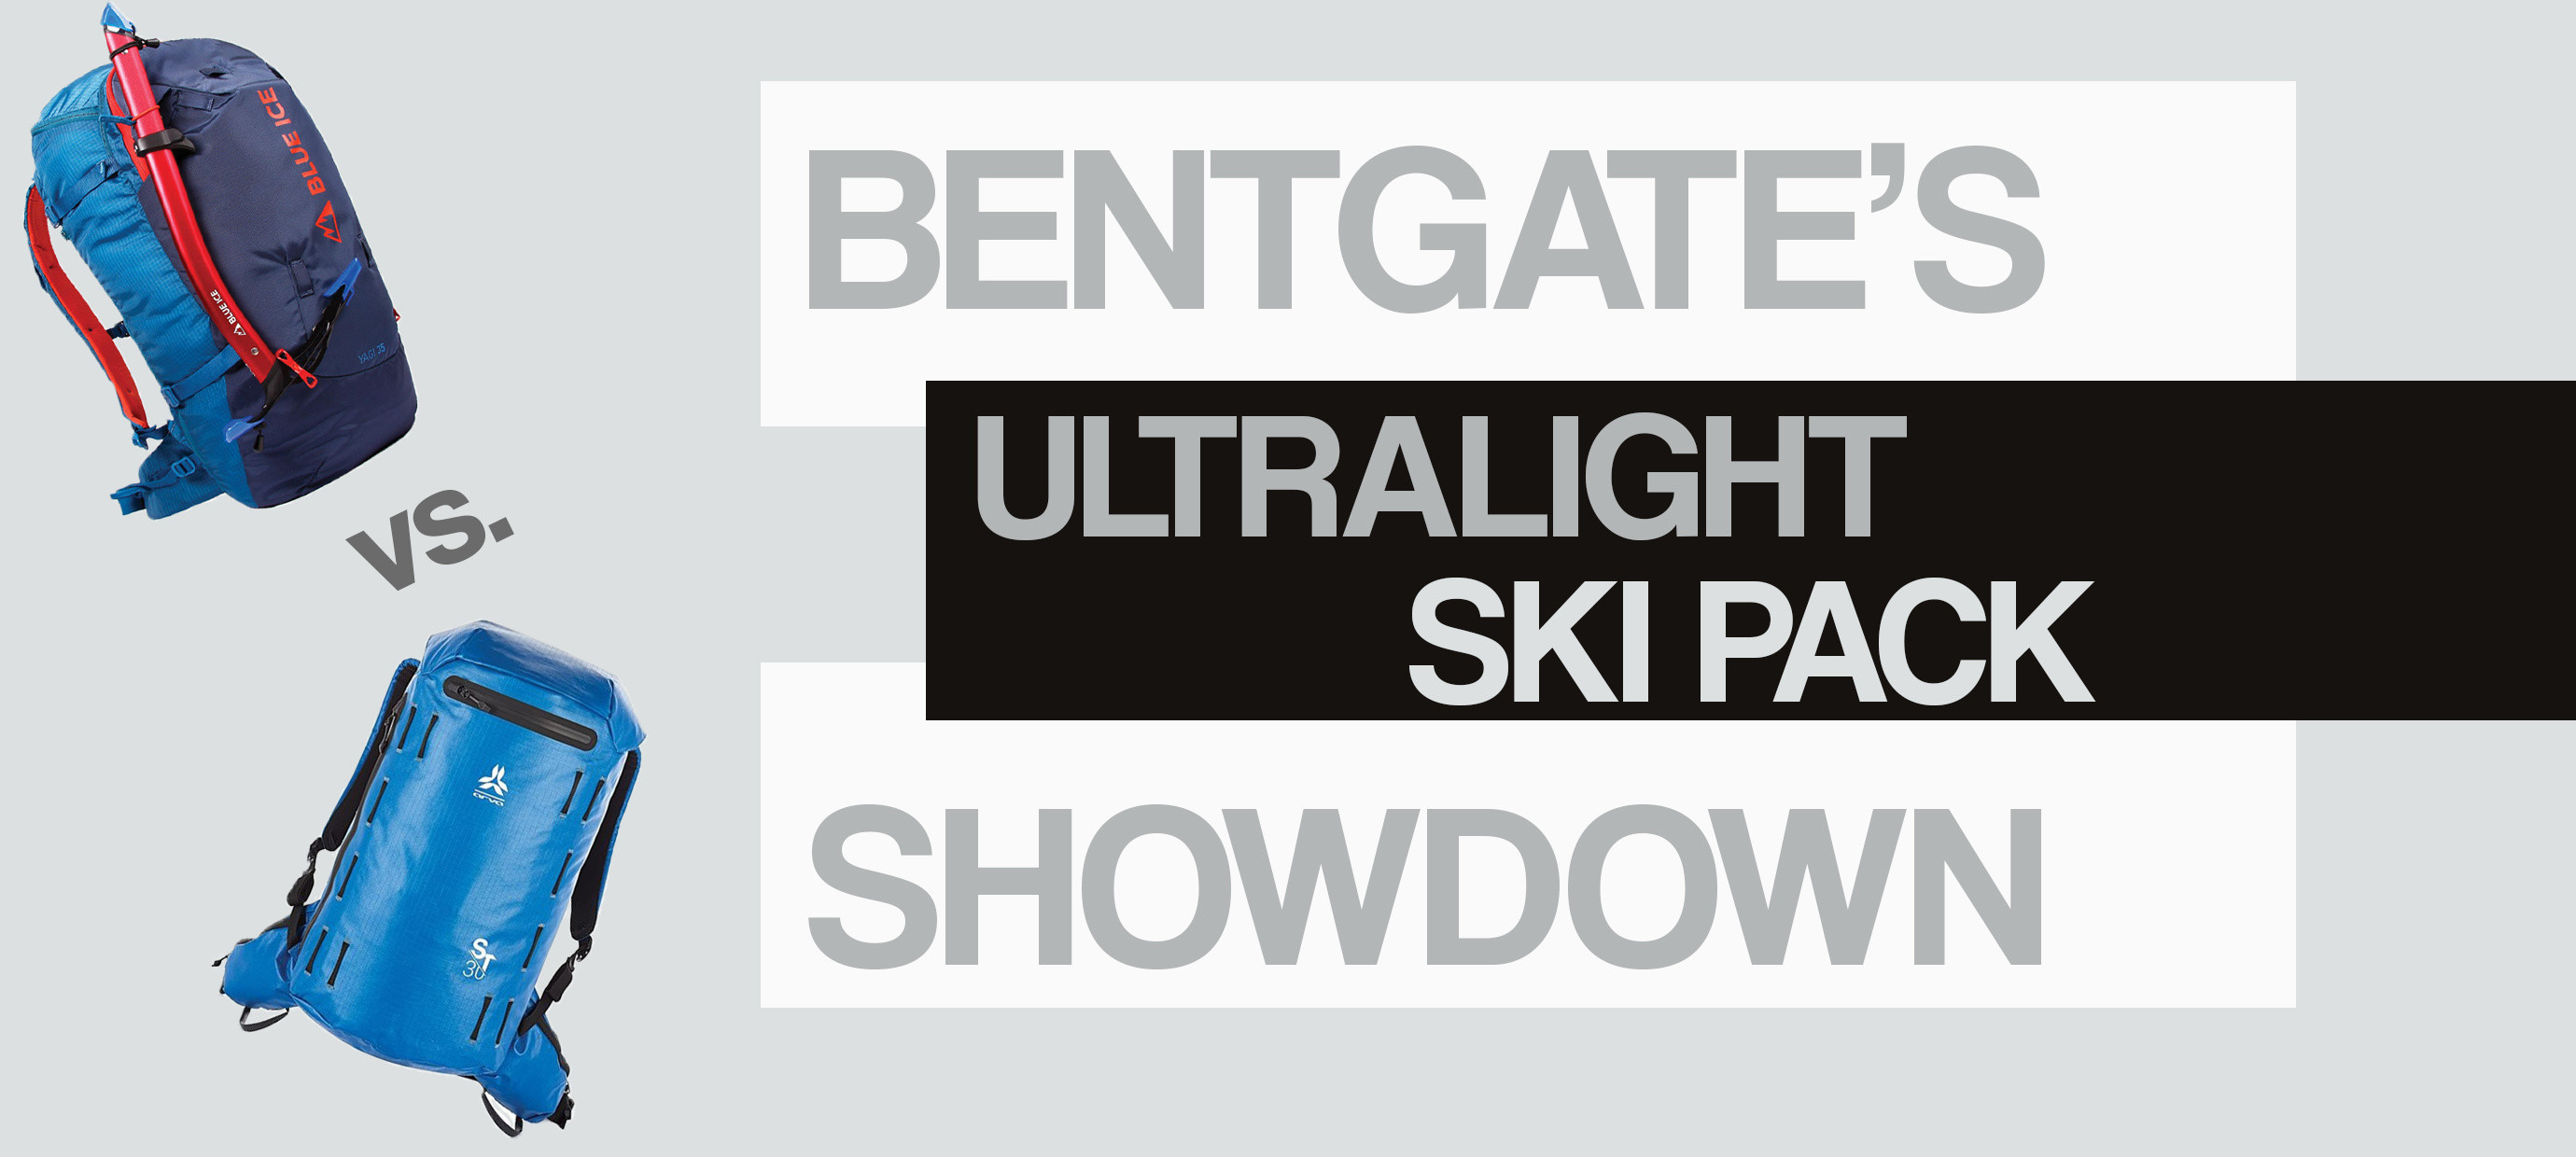 Bentgate's Ultralight Ski Pack Showdown